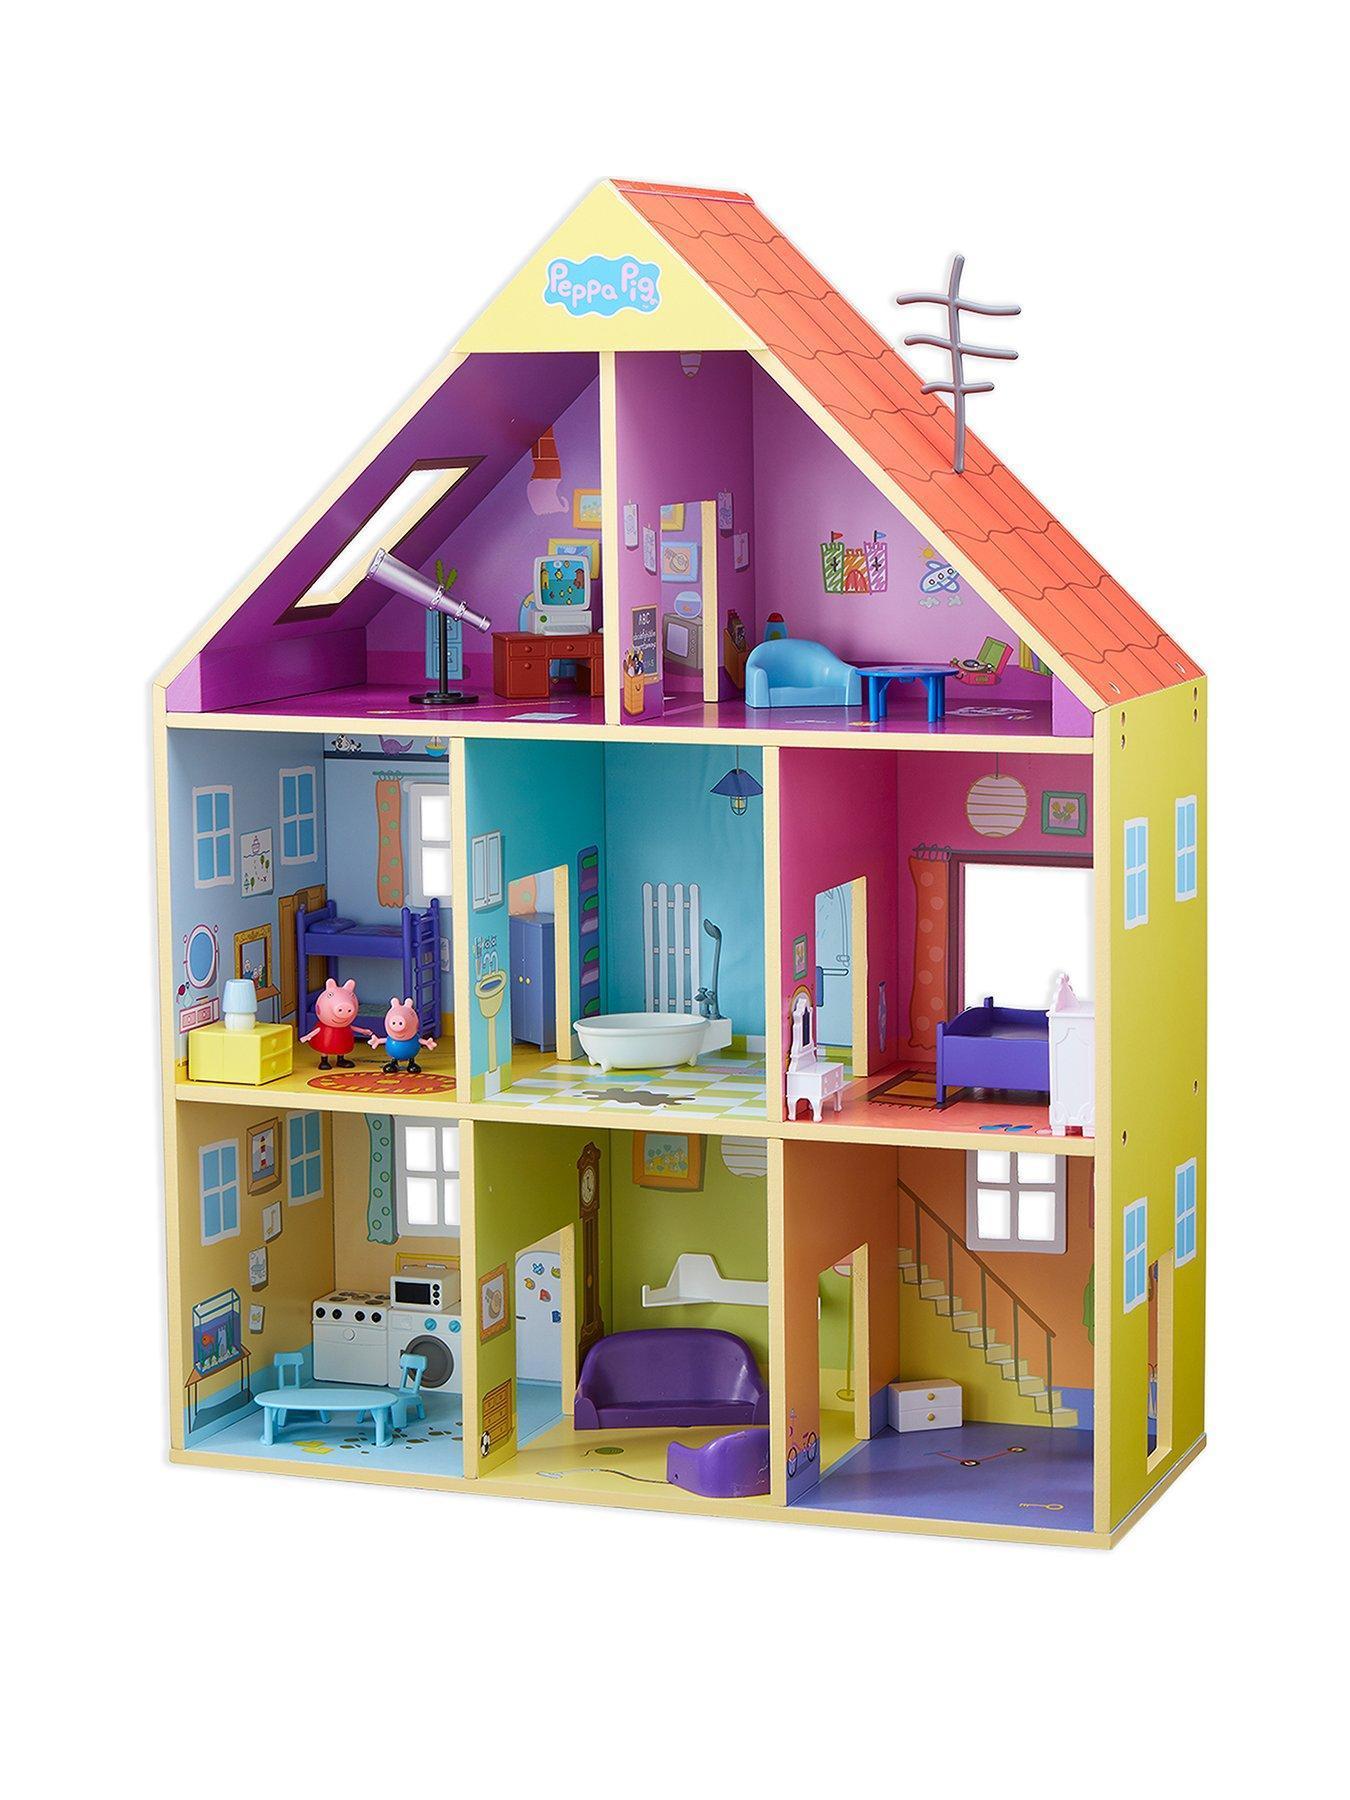 Peppa Pig DLX Wooden Playhouse